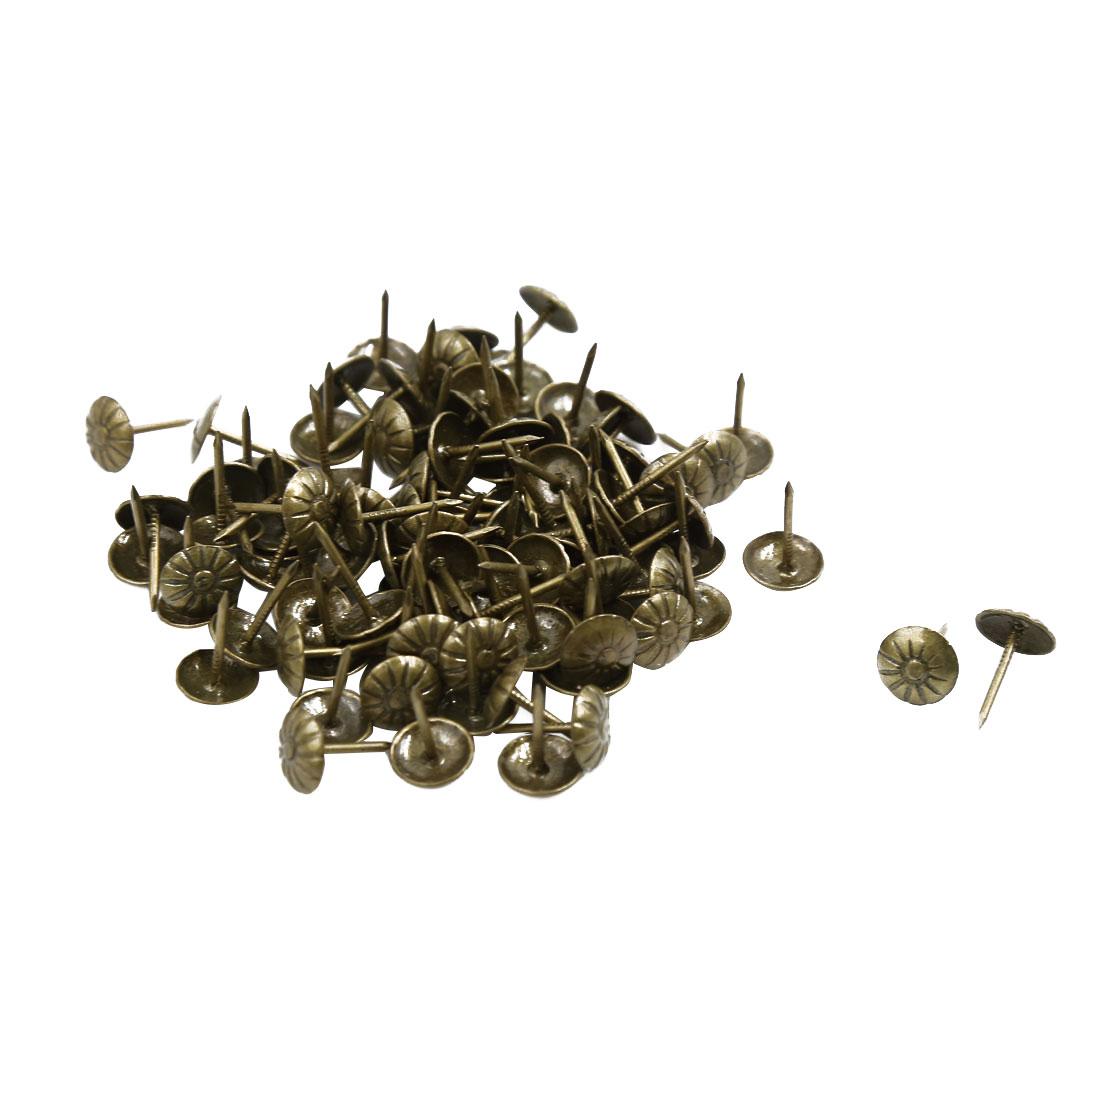 Corkboard Photo Flower Pattern Pushpin Thumb Tacks Bronze Tone 11mm Dia 100pcs